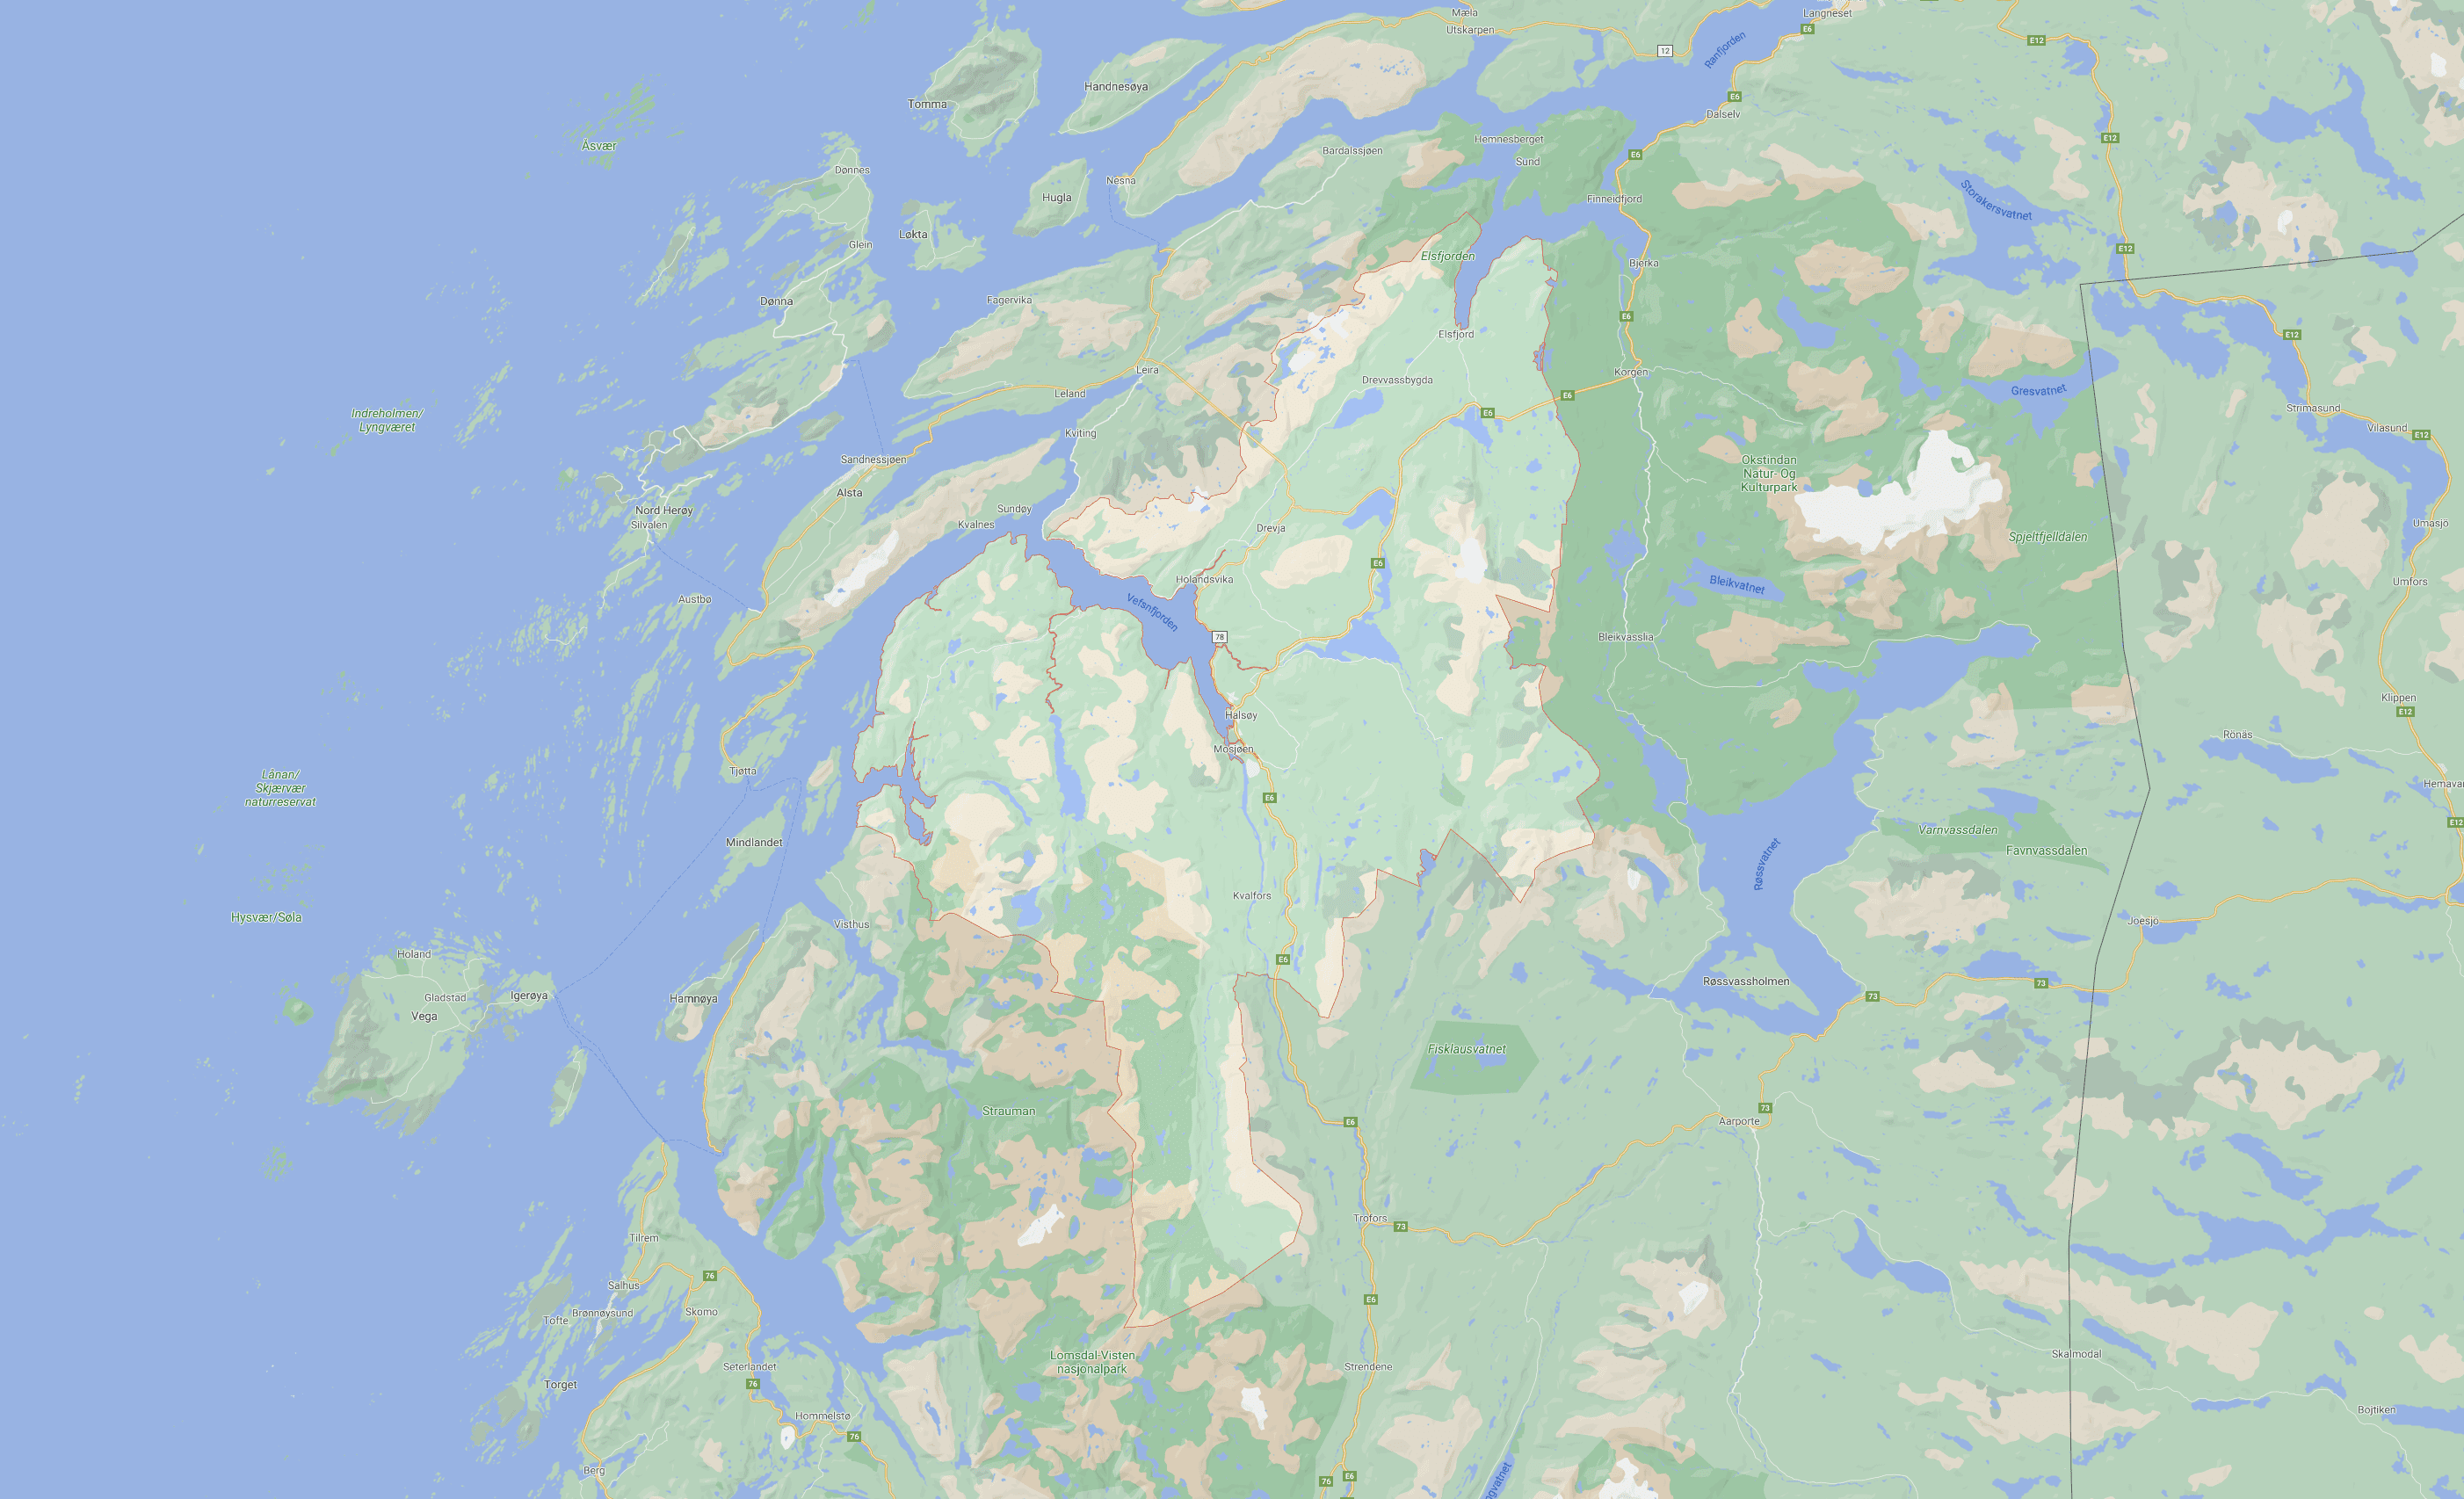 Strøm Vefsn kommune